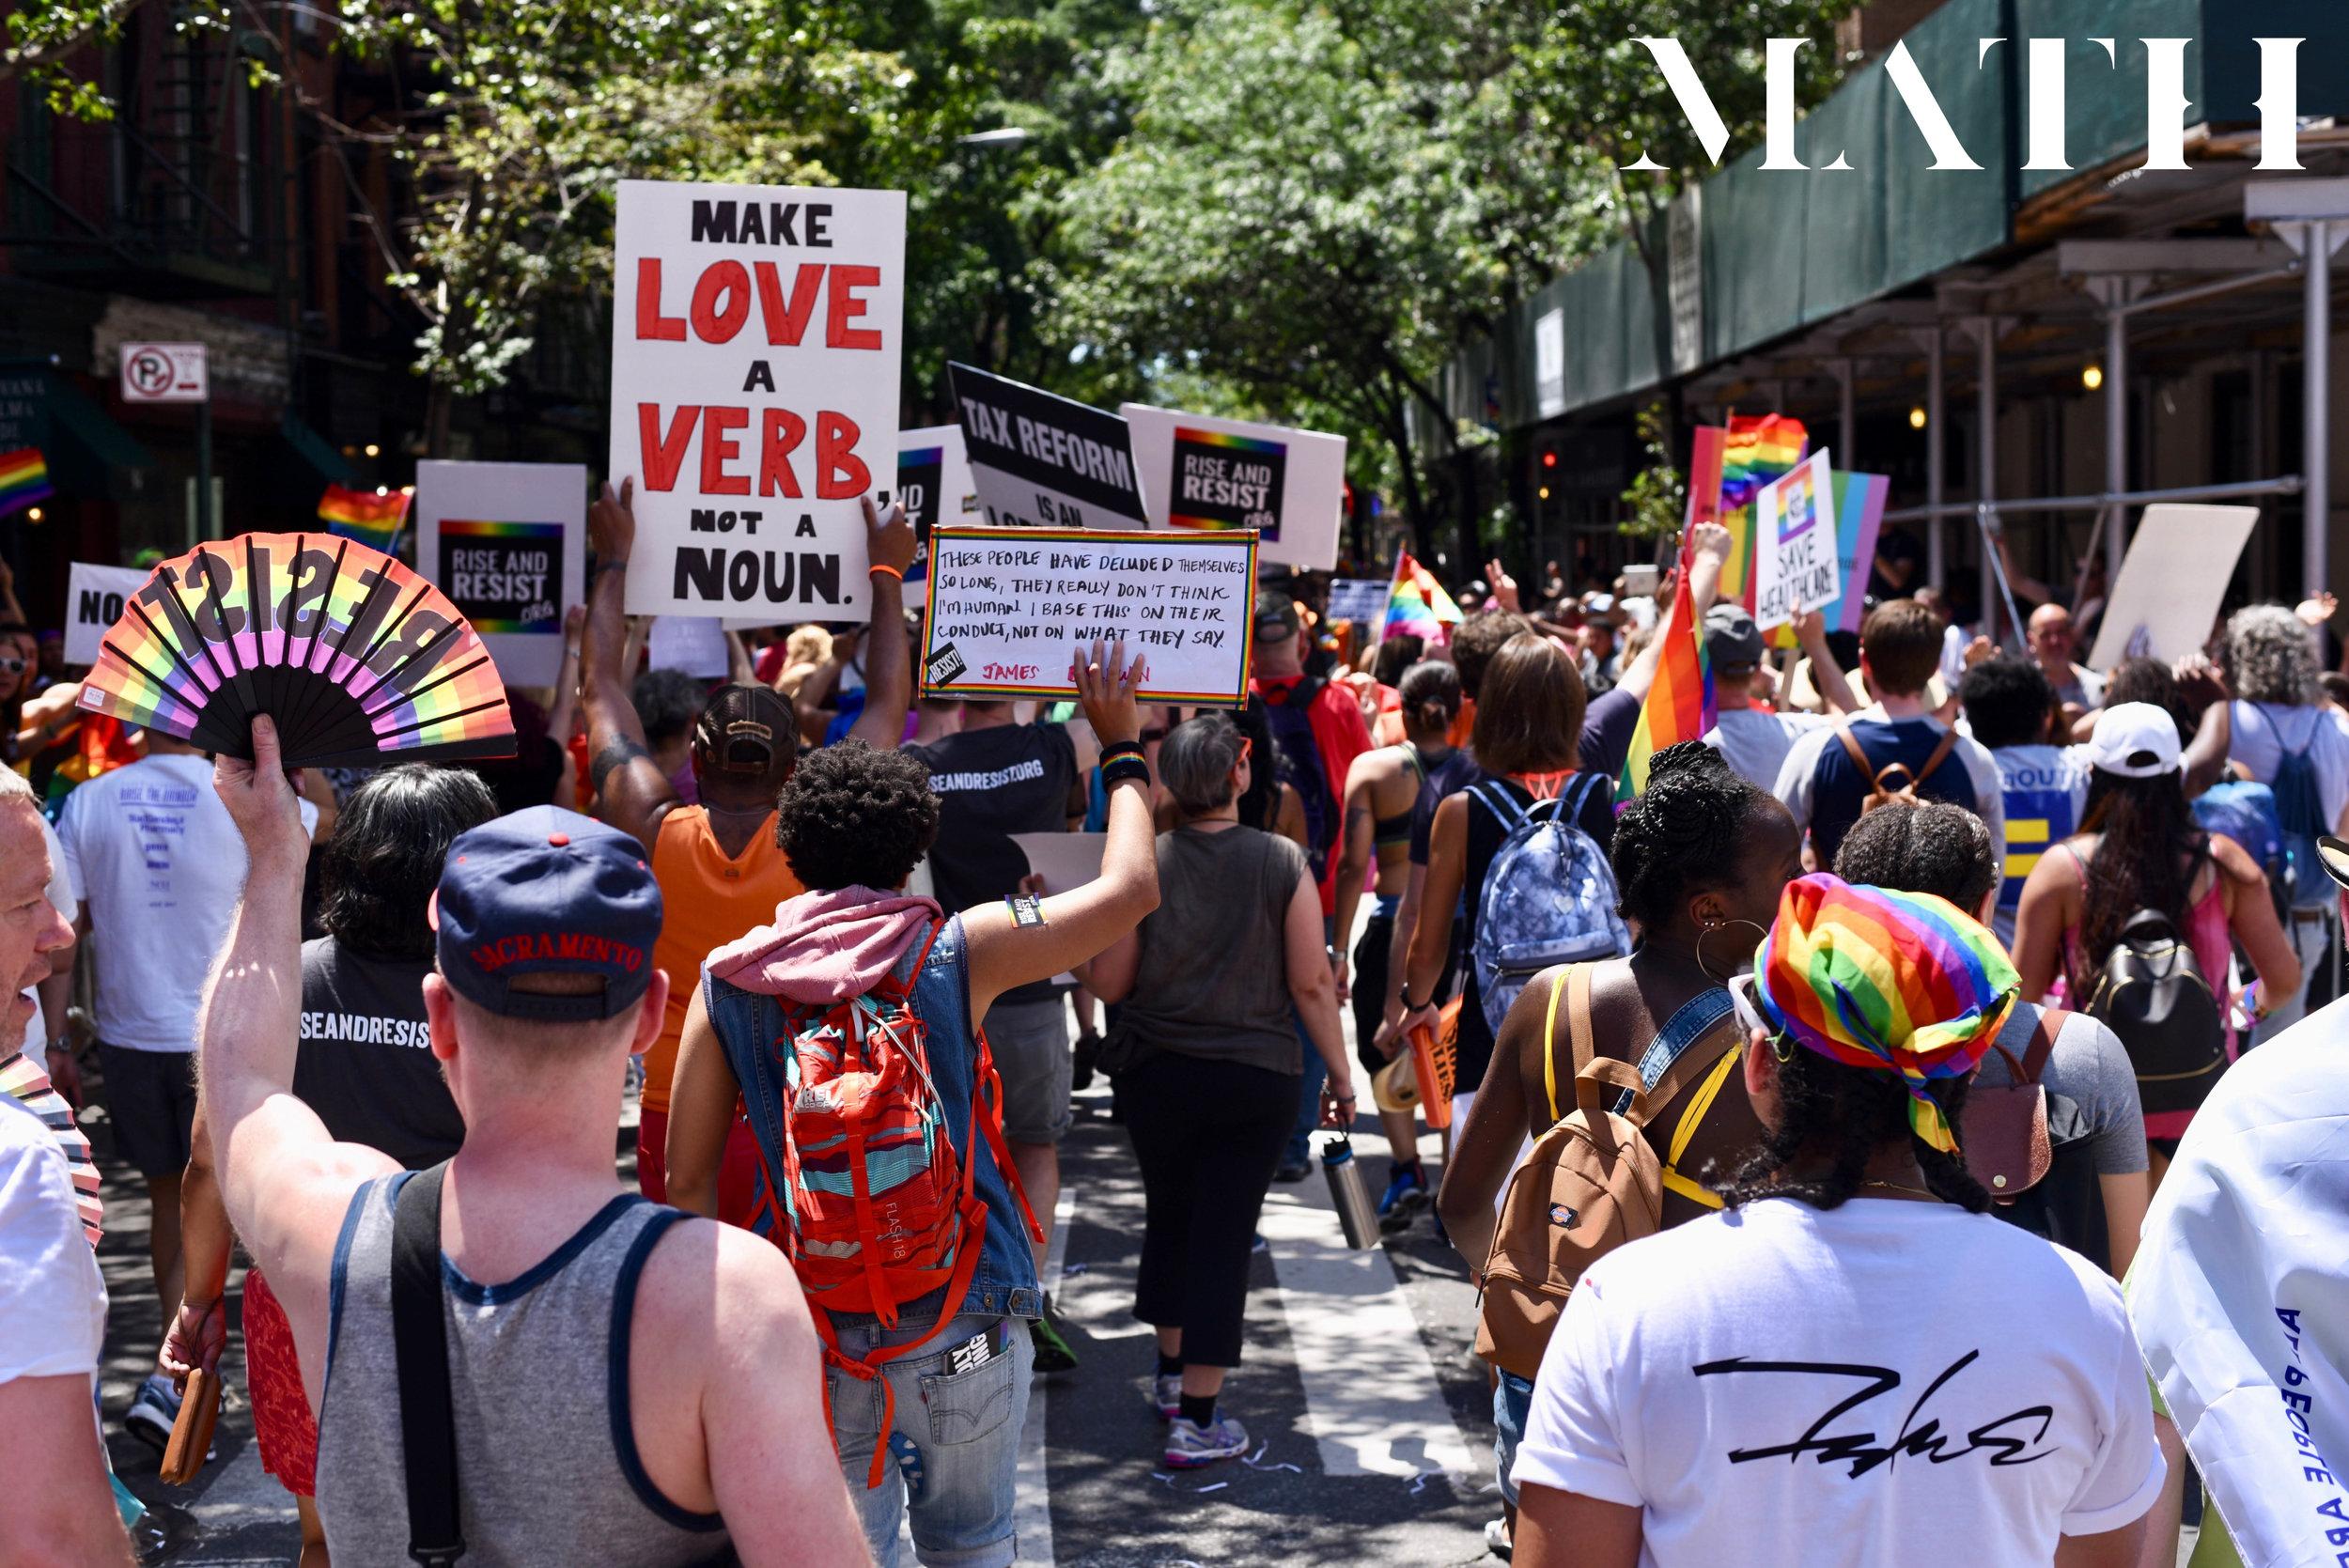 NYC Pride_Ginger Hollander 2.jpg